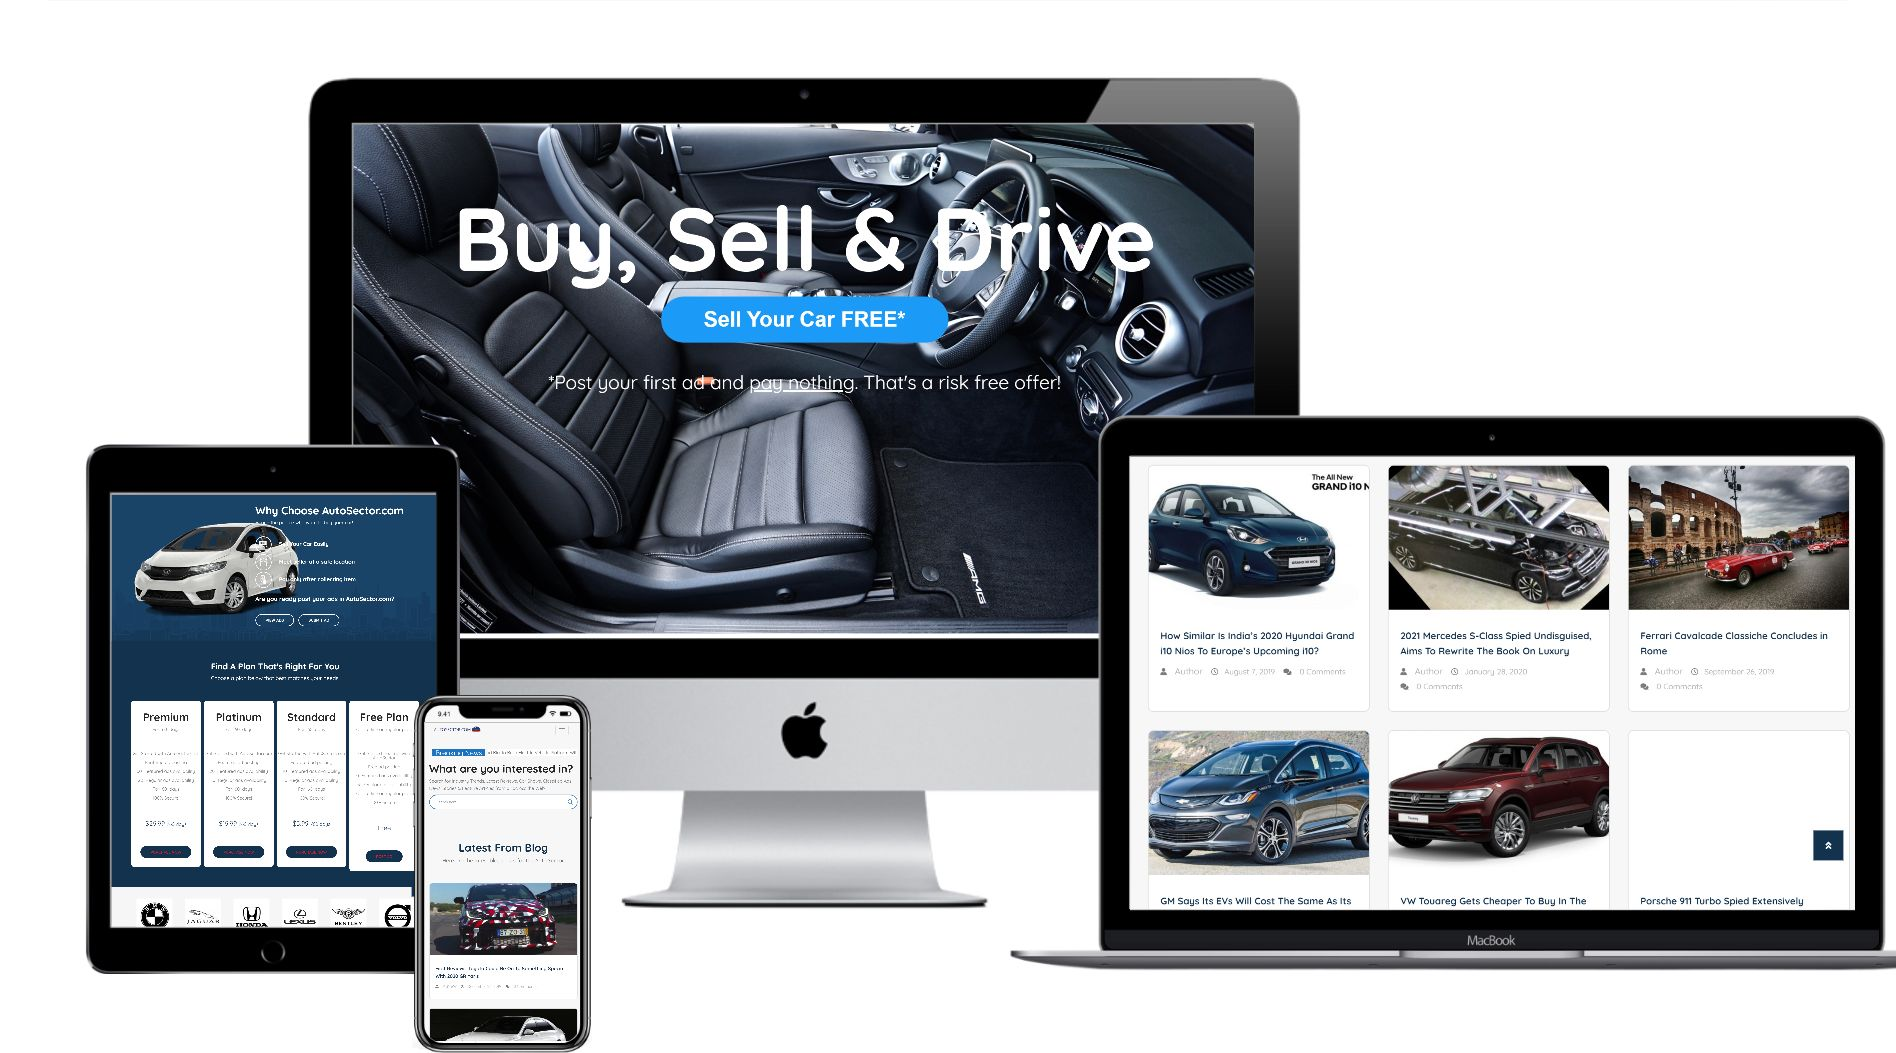 Autosector.com